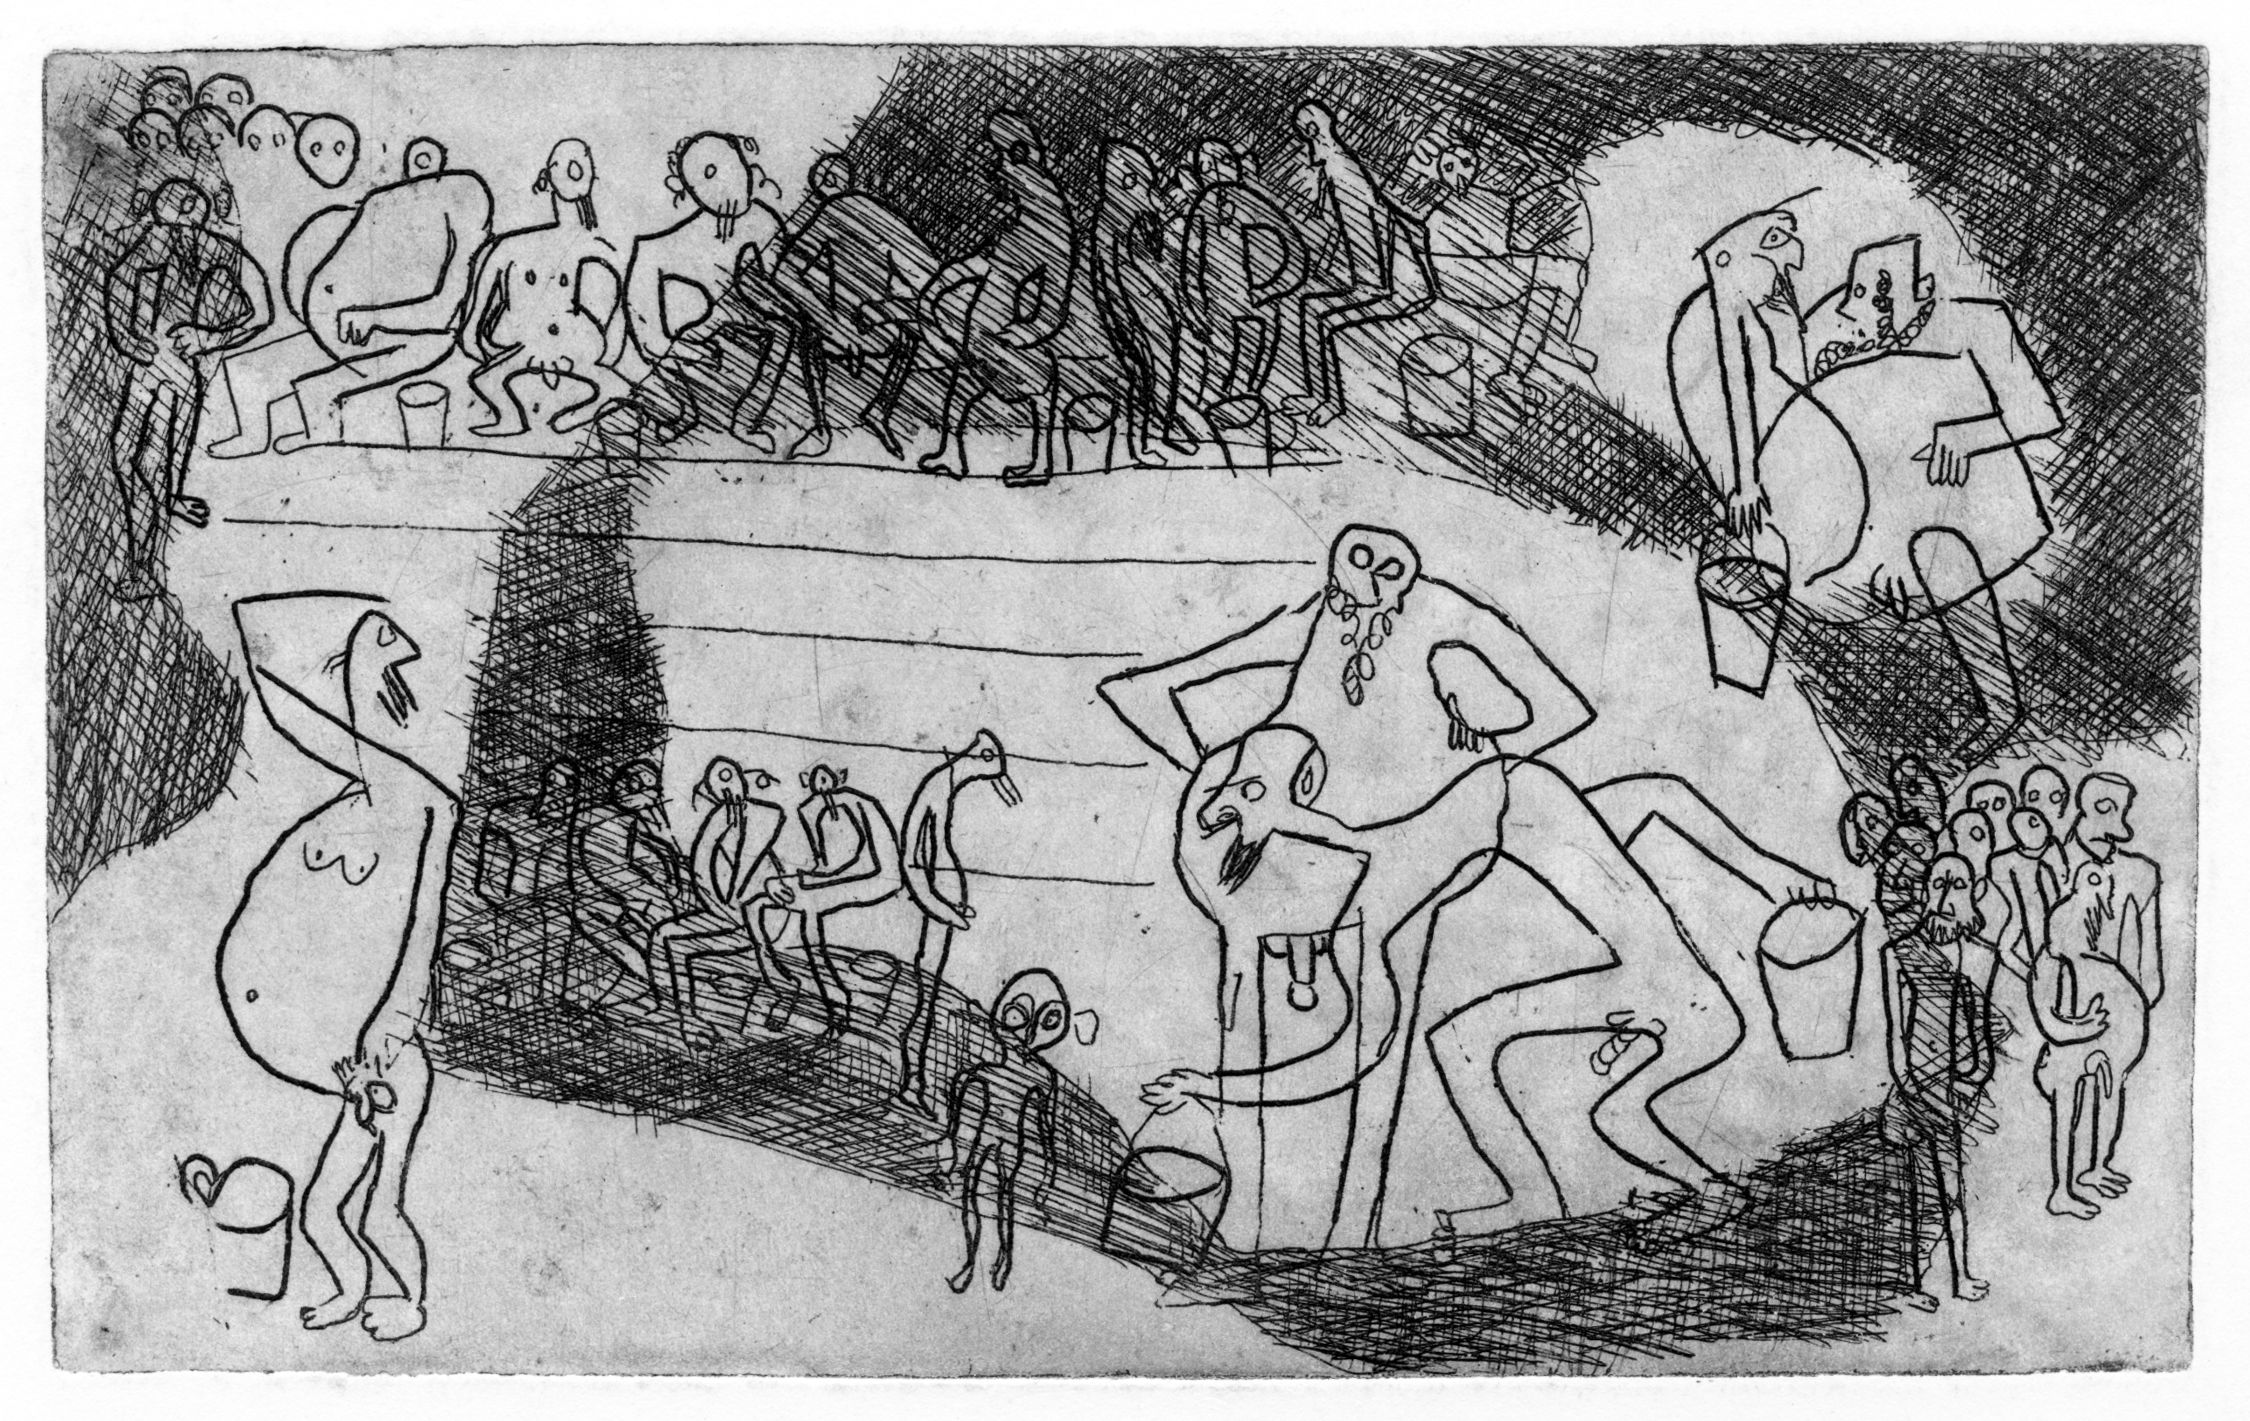 Леопольд Левицький. Міква, 1932; офорт, NMWr